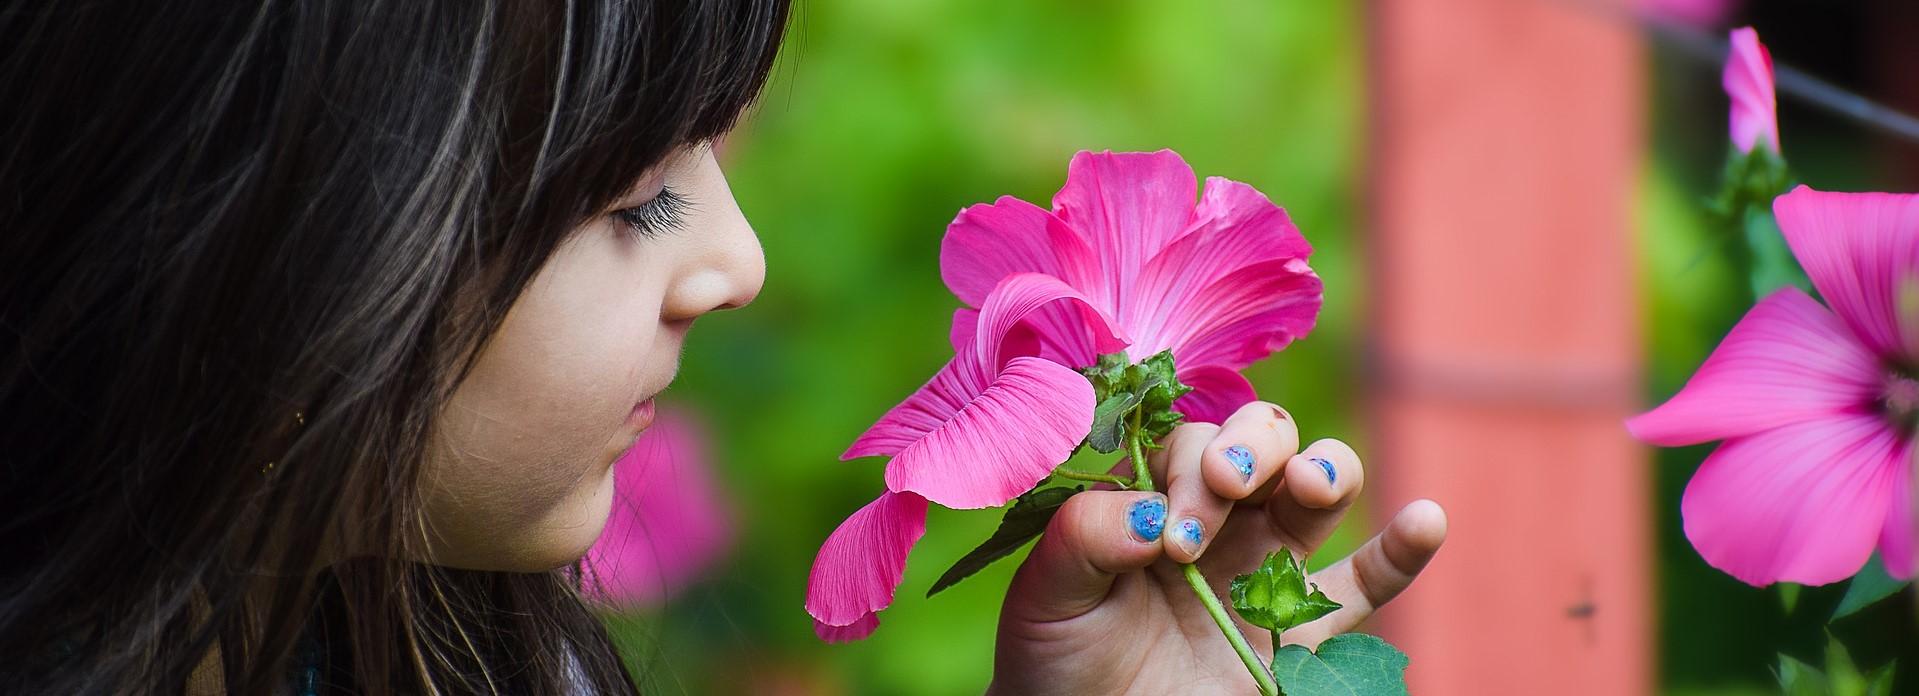 Little Girl in Wyoming enjoying Flowers | Kids Car Donations